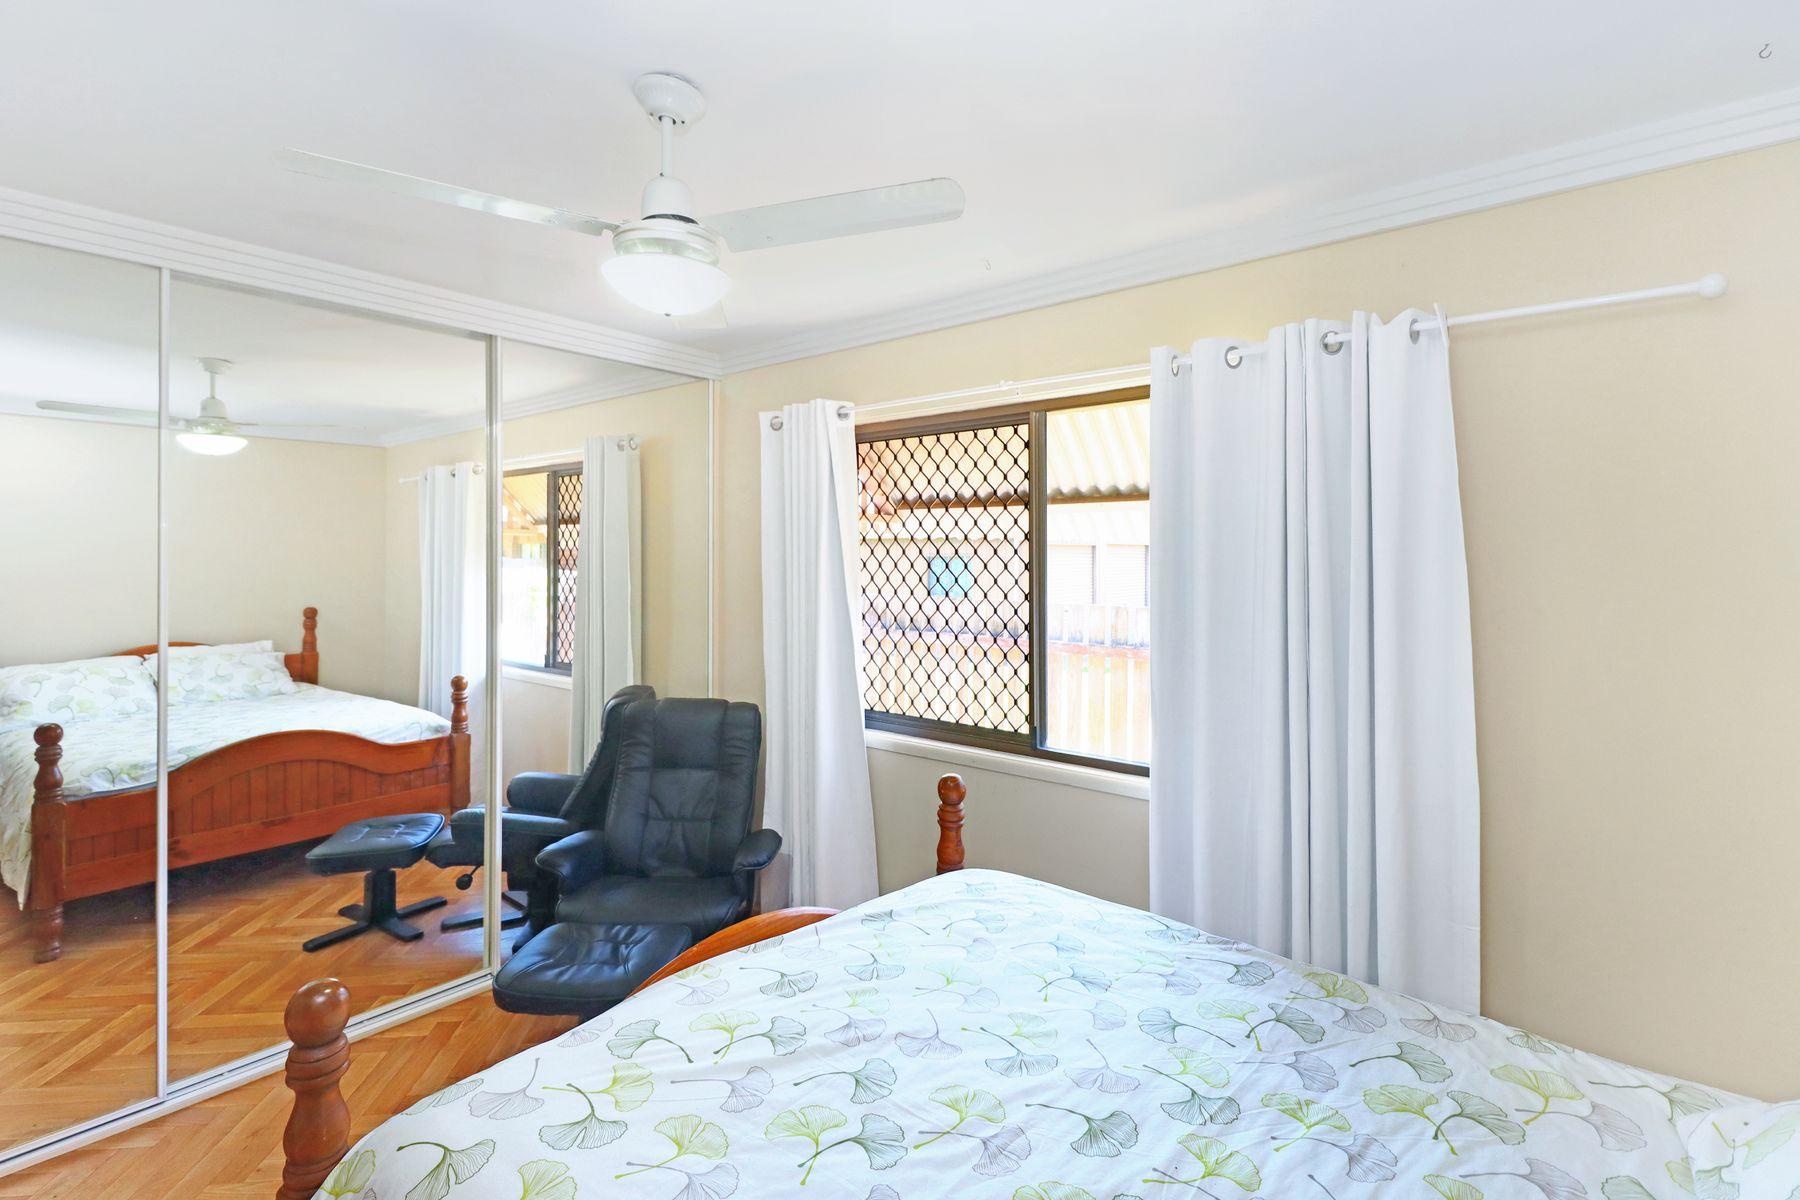 26 Frangipanni Avenue, Kawungan, QLD 4655